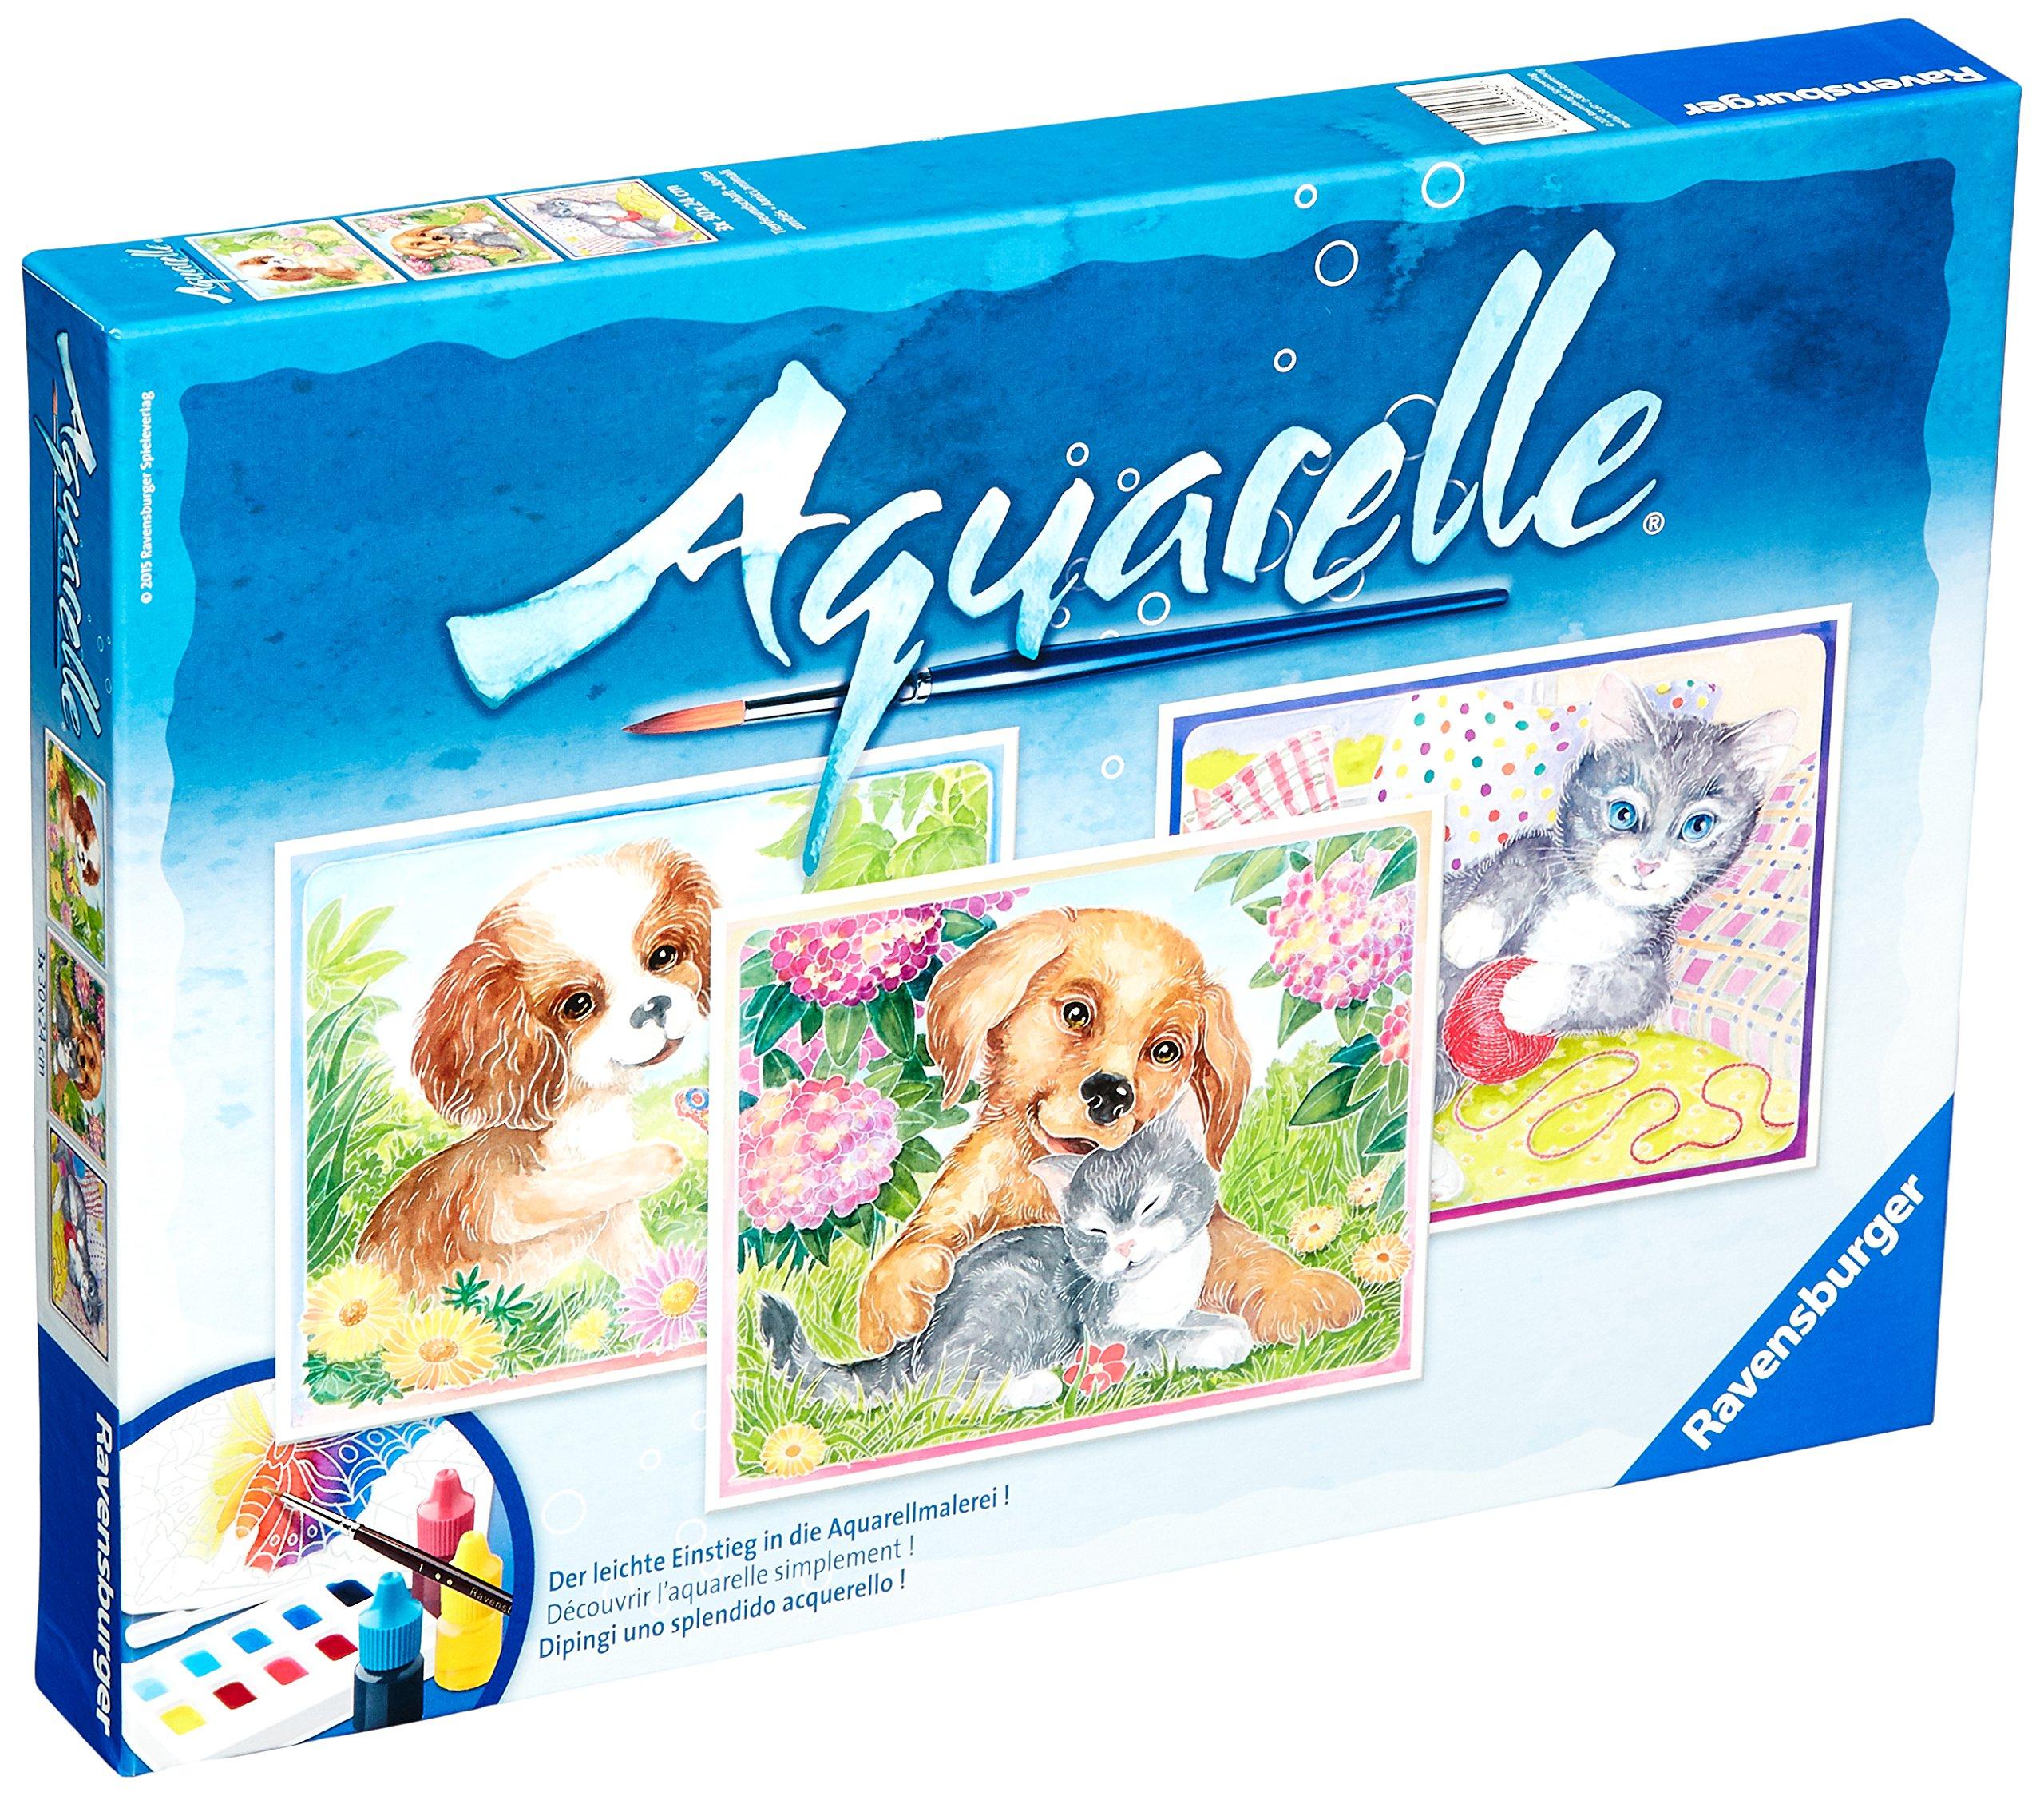 Ravensburger Aquarelle Watercolors Made Easy Animal Friends Playset